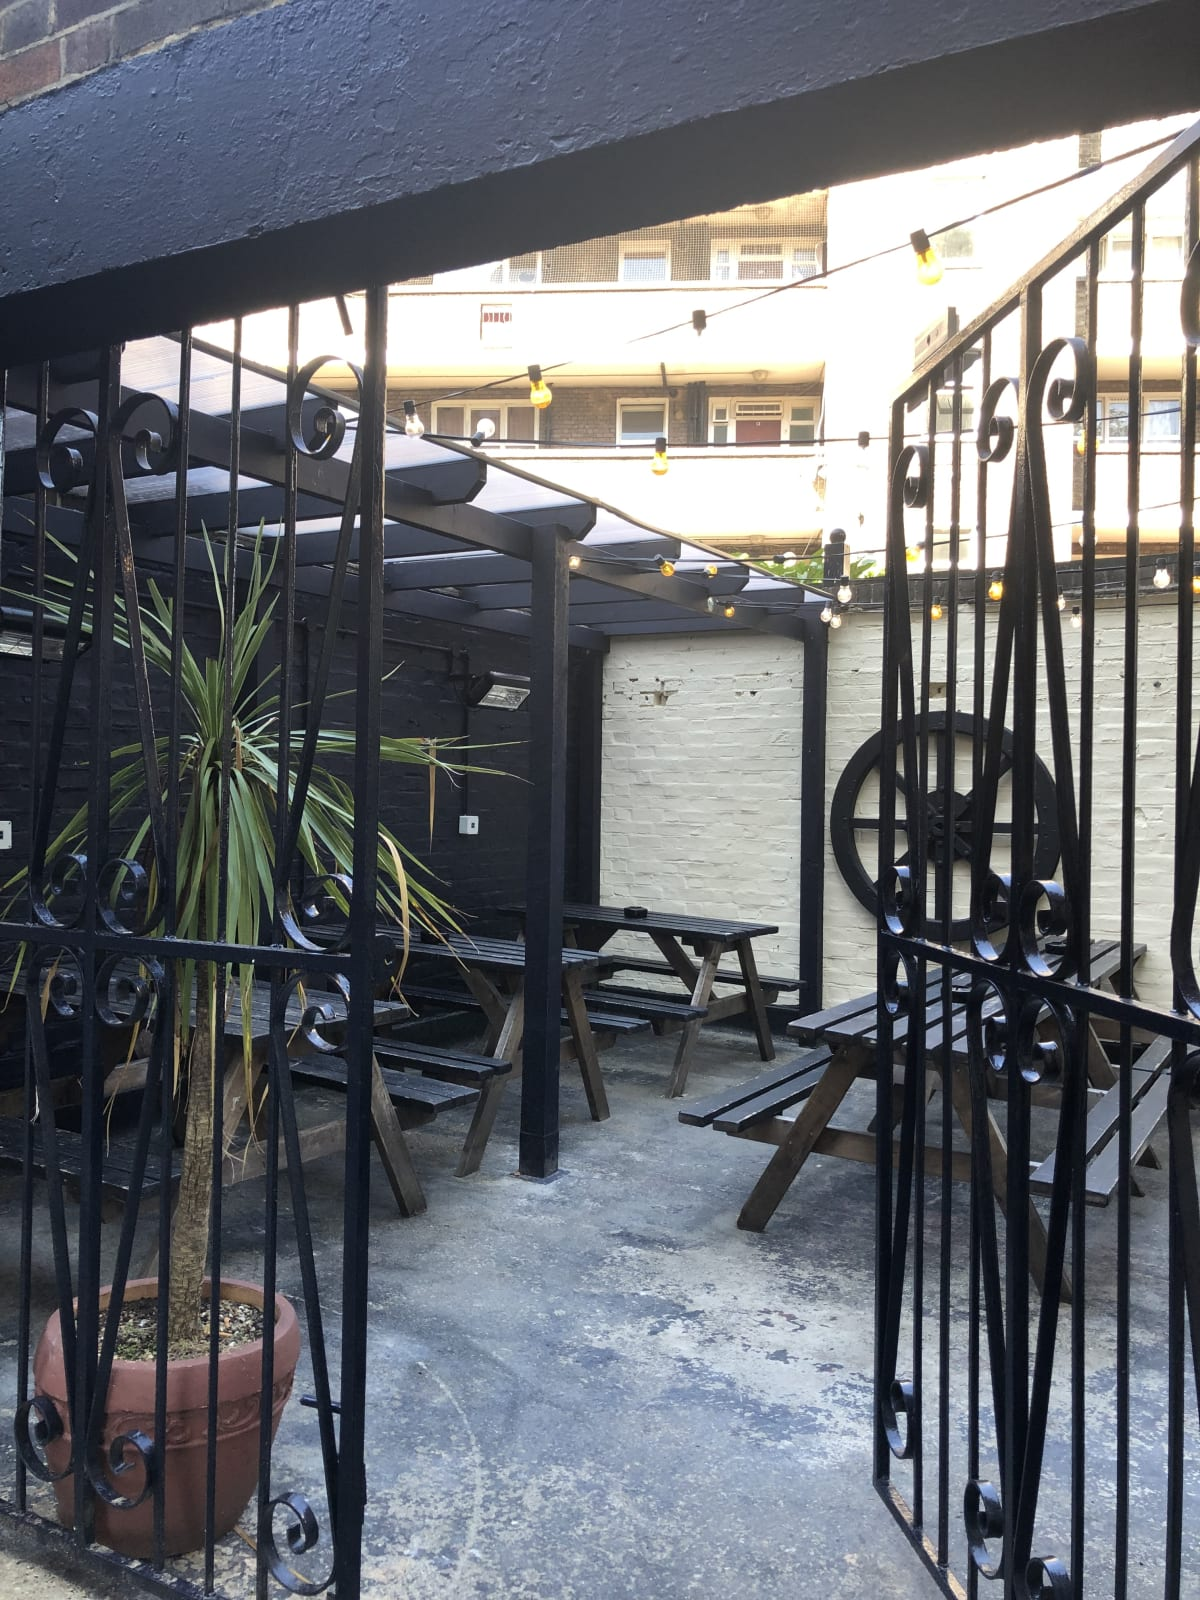 PubLove @ The Steam Engine, Waterloo, London, England